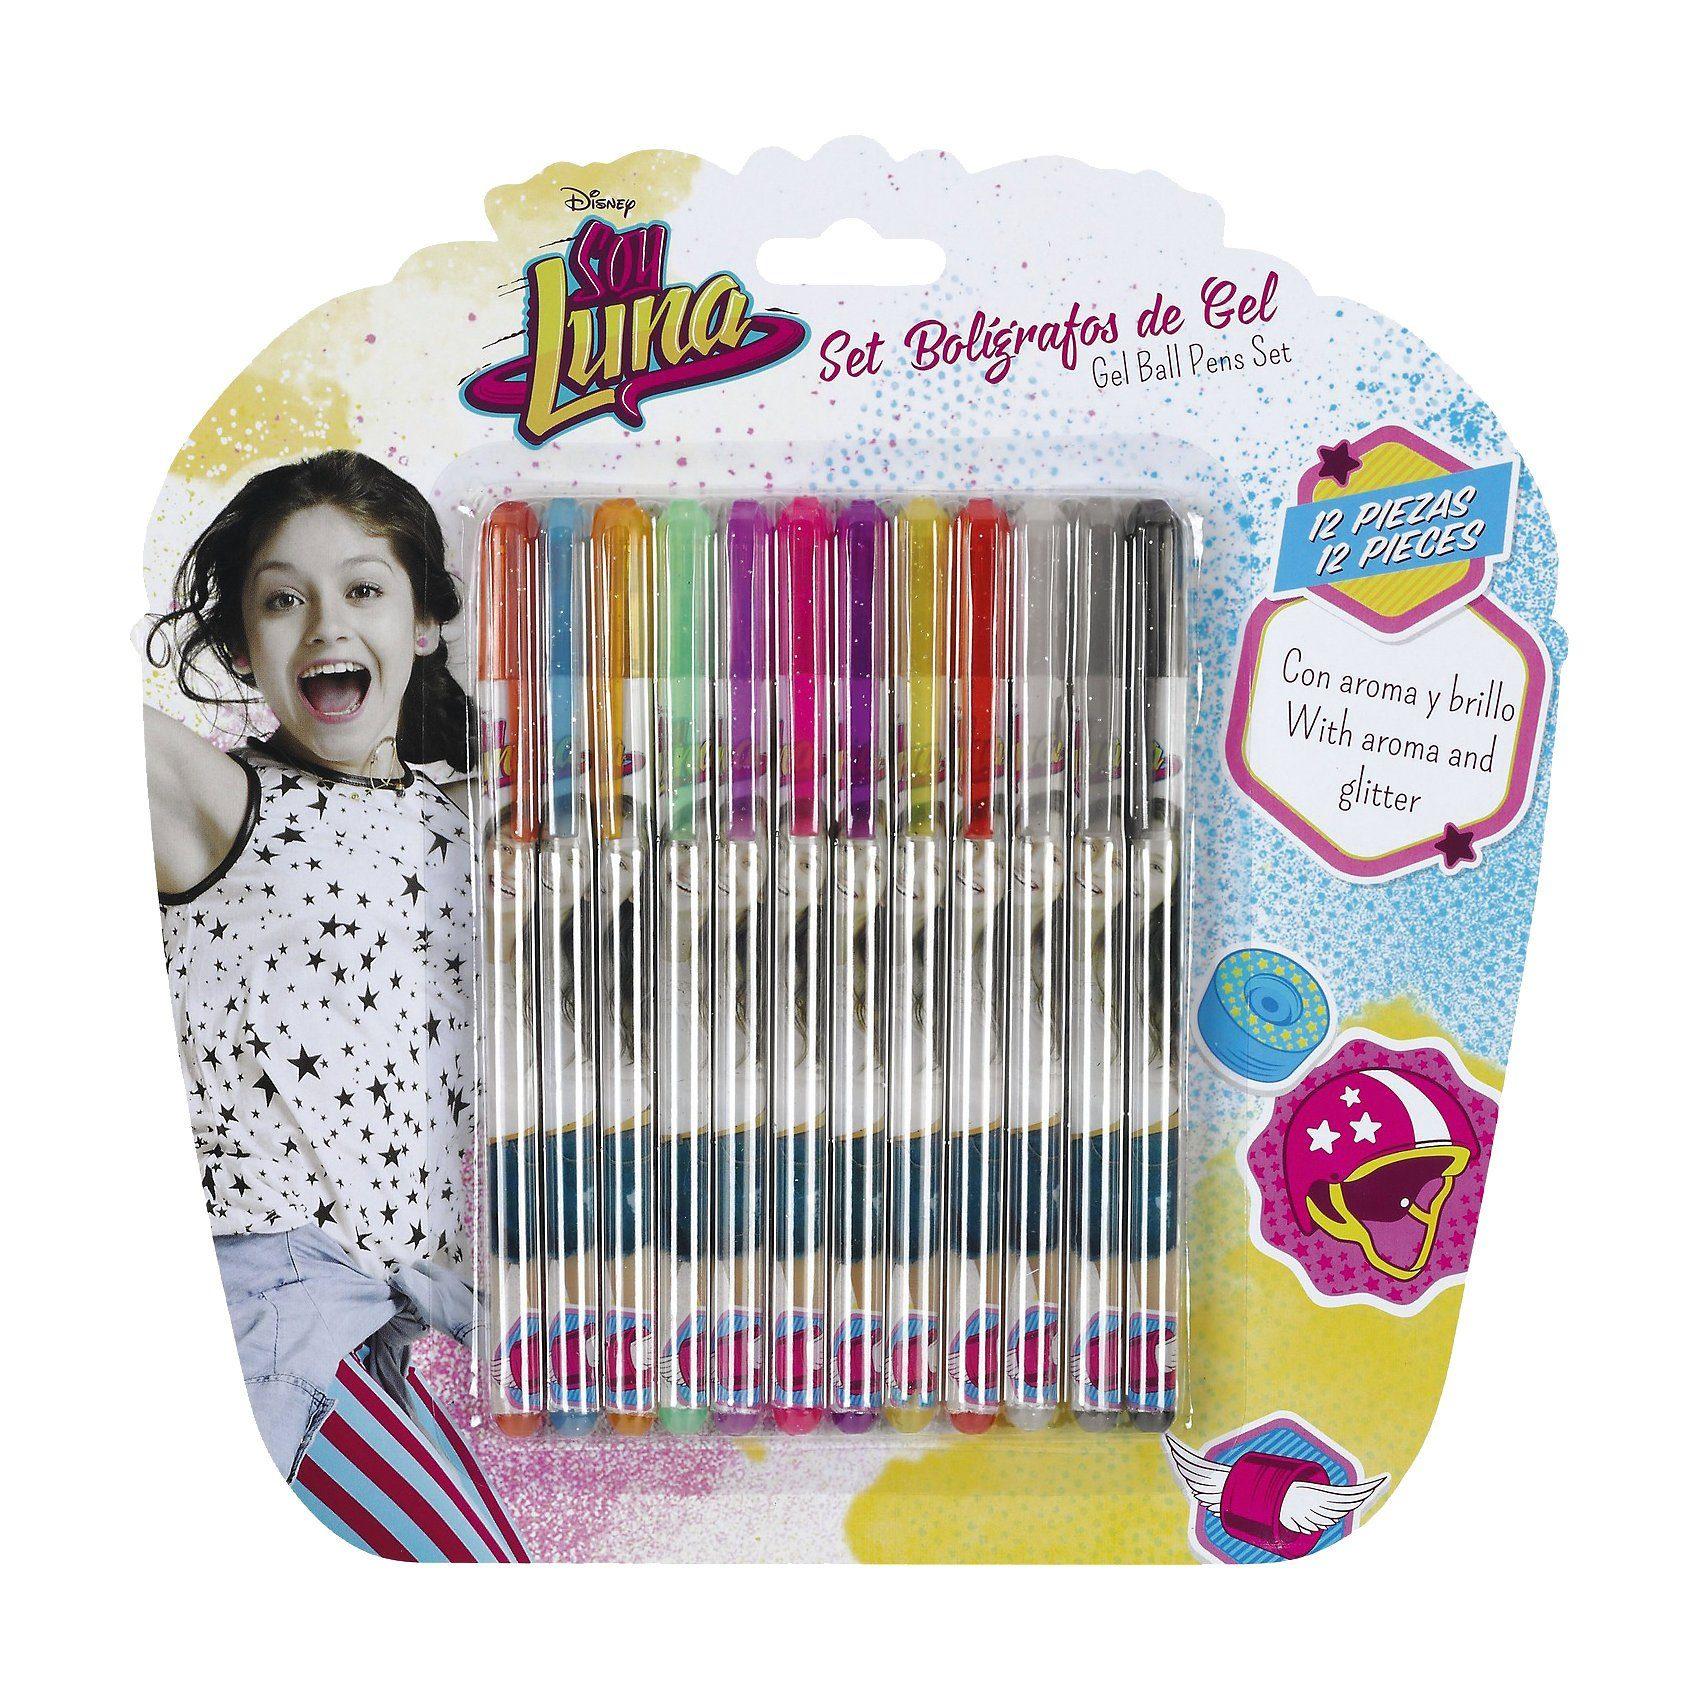 safta Gelstifte Soy Luna, 12 Farben